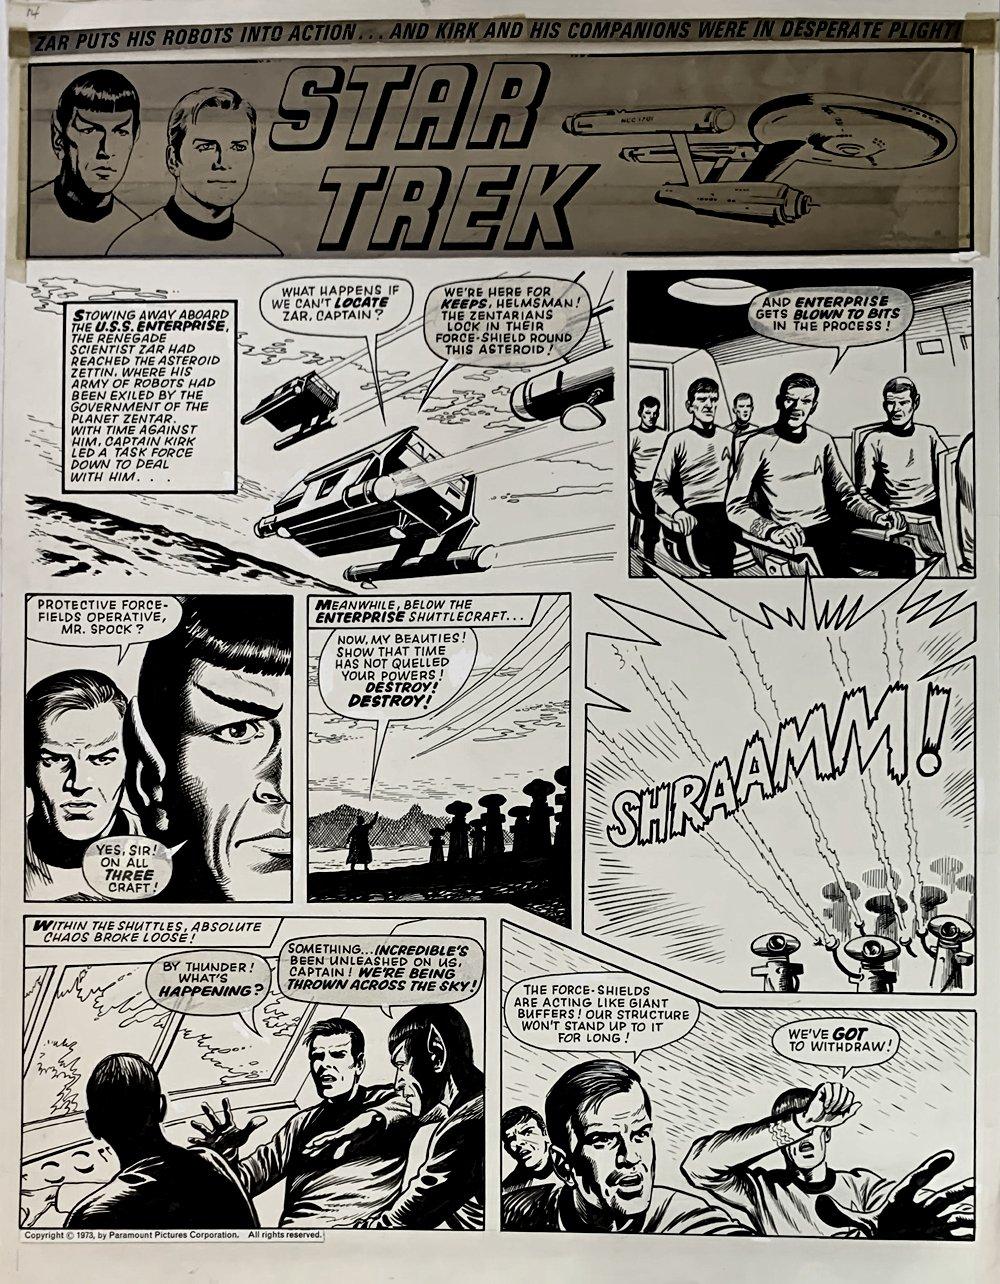 Star Trek Newspaper Strip 2-3-1973 (VERY LARGE)